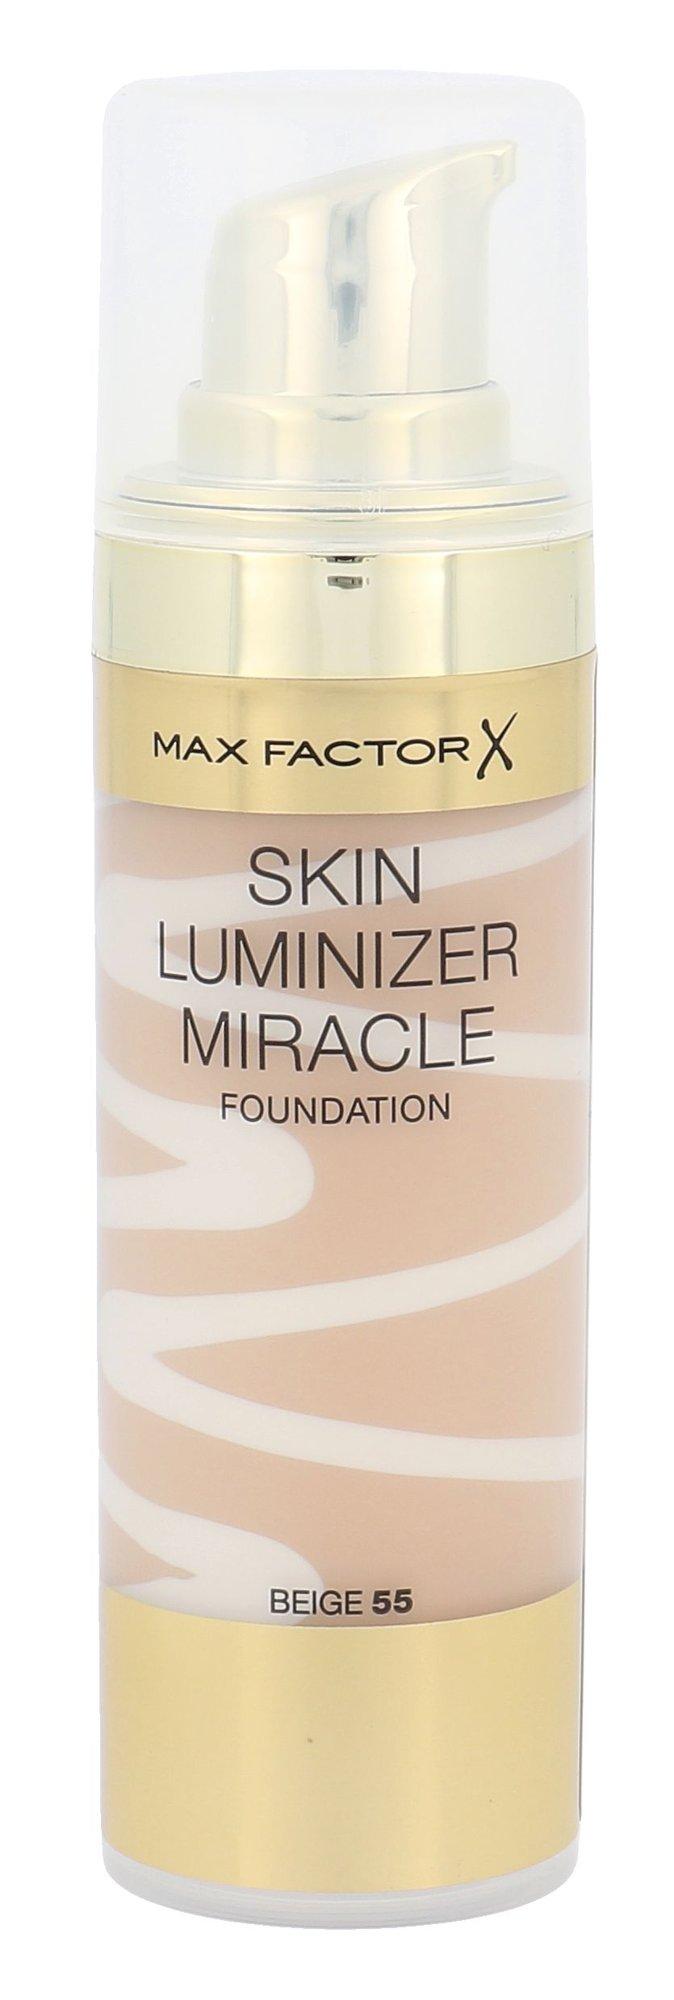 Max Factor Skin Luminizer Cosmetic 30ml 55 Beige